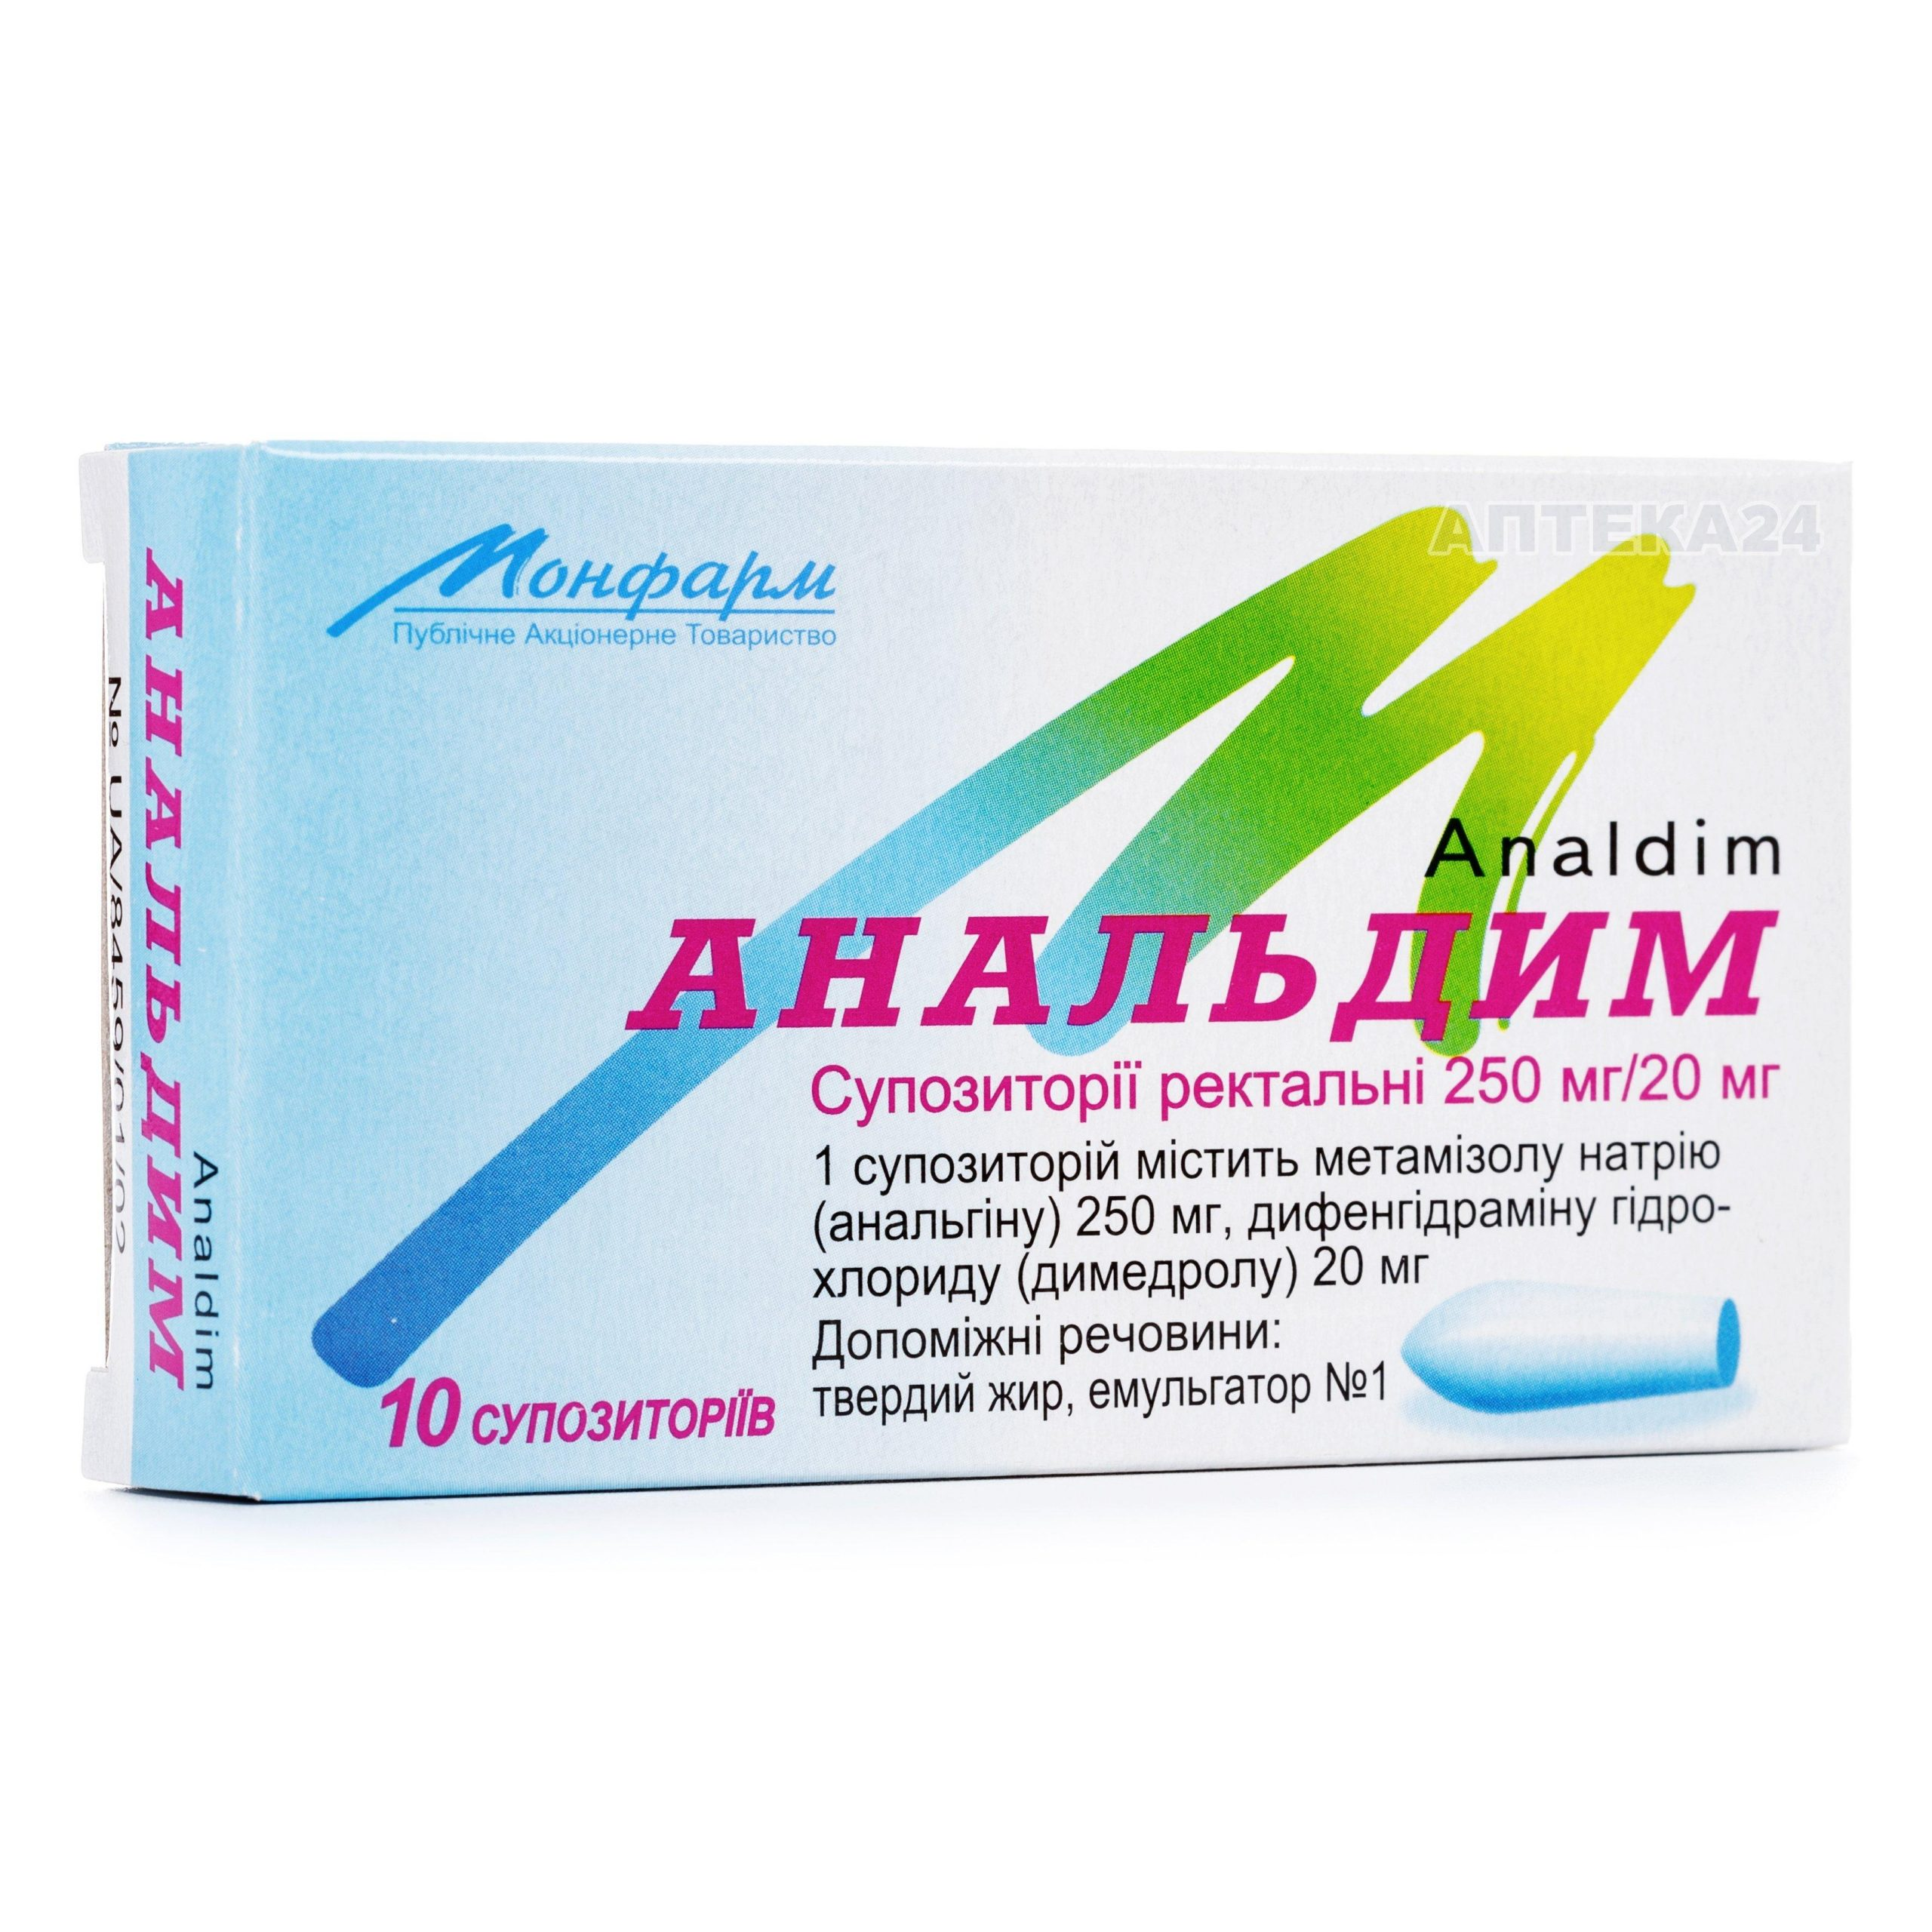 Анальдим свечи 250 мг/20 мг N10_6005c6a0edeba.jpeg